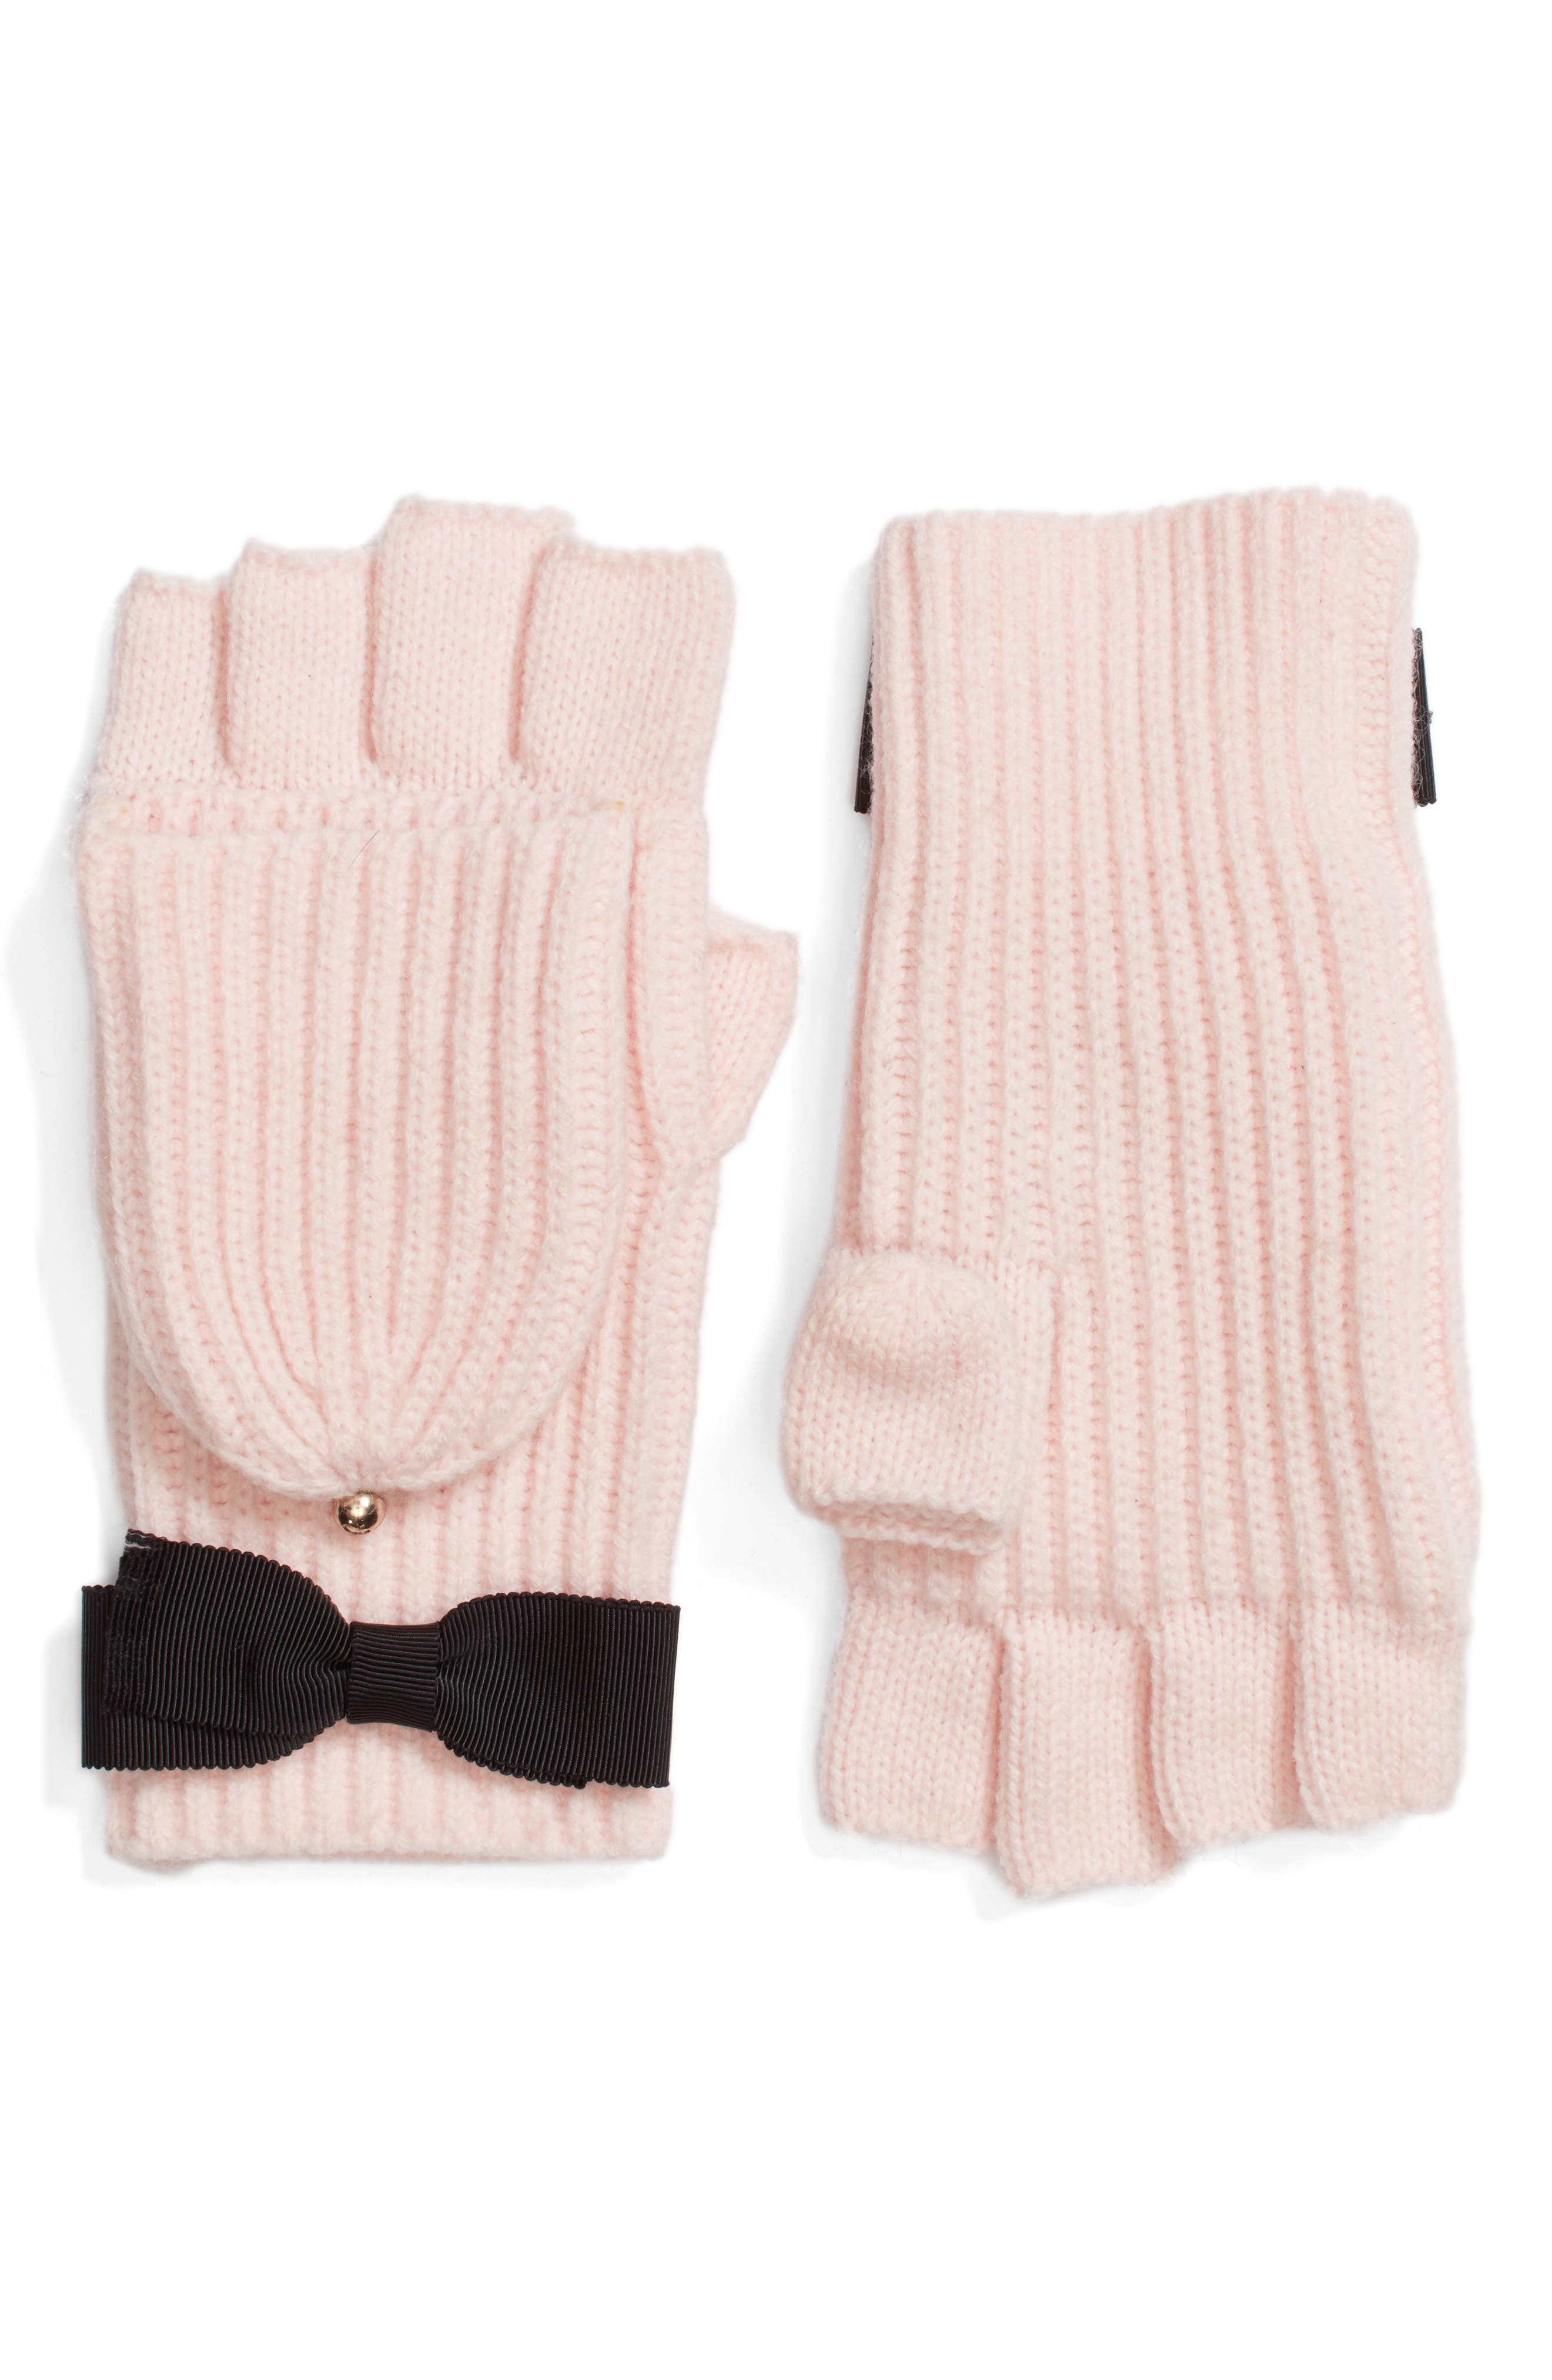 Main Image - kate spade new york grosgrain bow convertible knit mittens